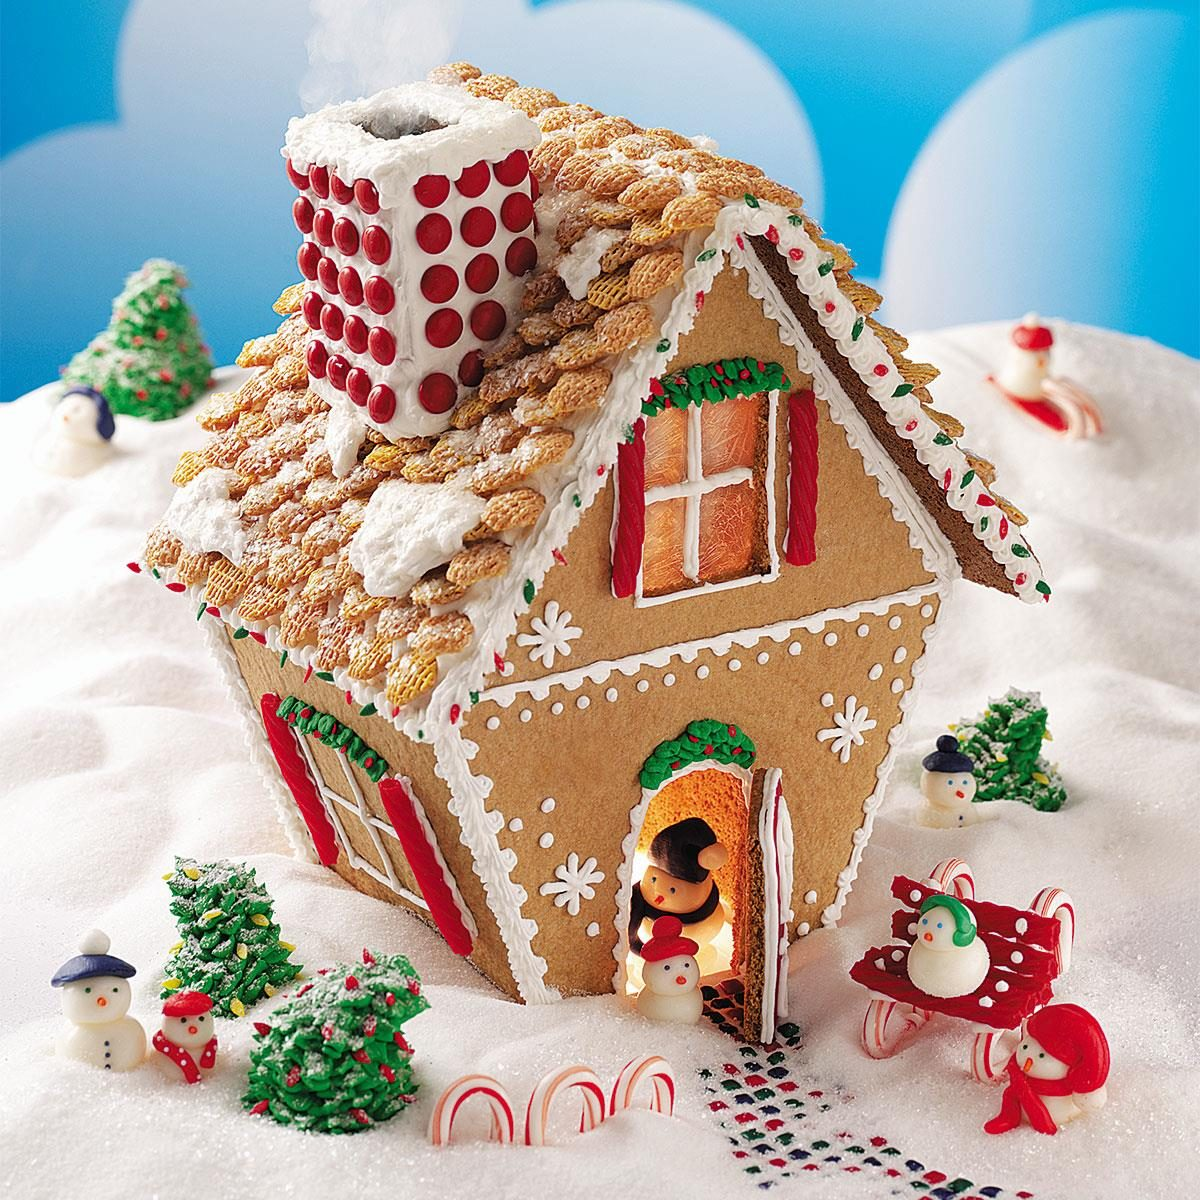 Cute Kiwi Wallpaper Winter Wonderland Gingerbread Cottage Recipe Taste Of Home